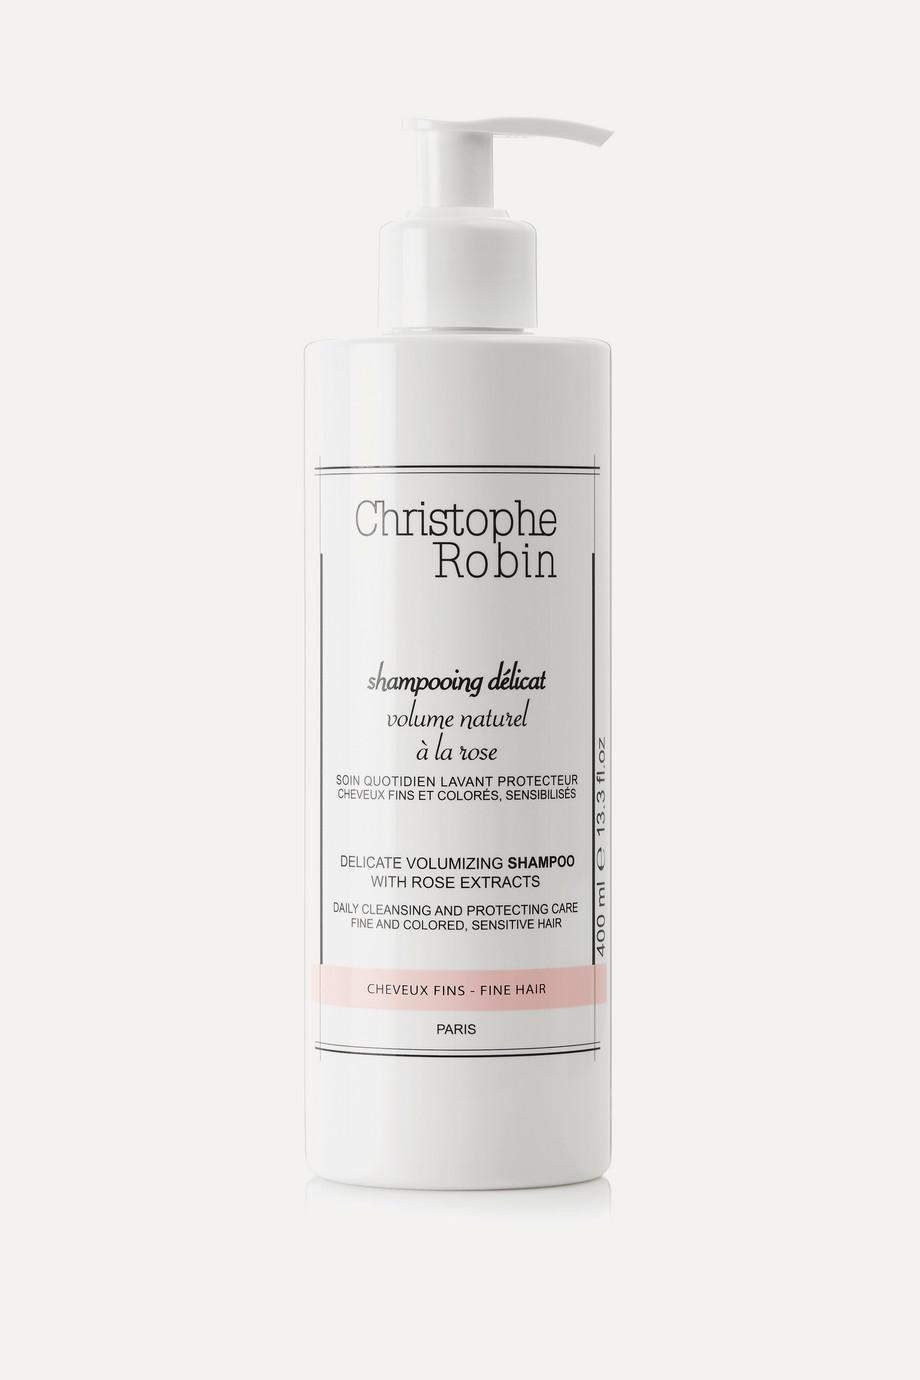 Christophe Robin Delicate Volumizing Shampoo, 400ml